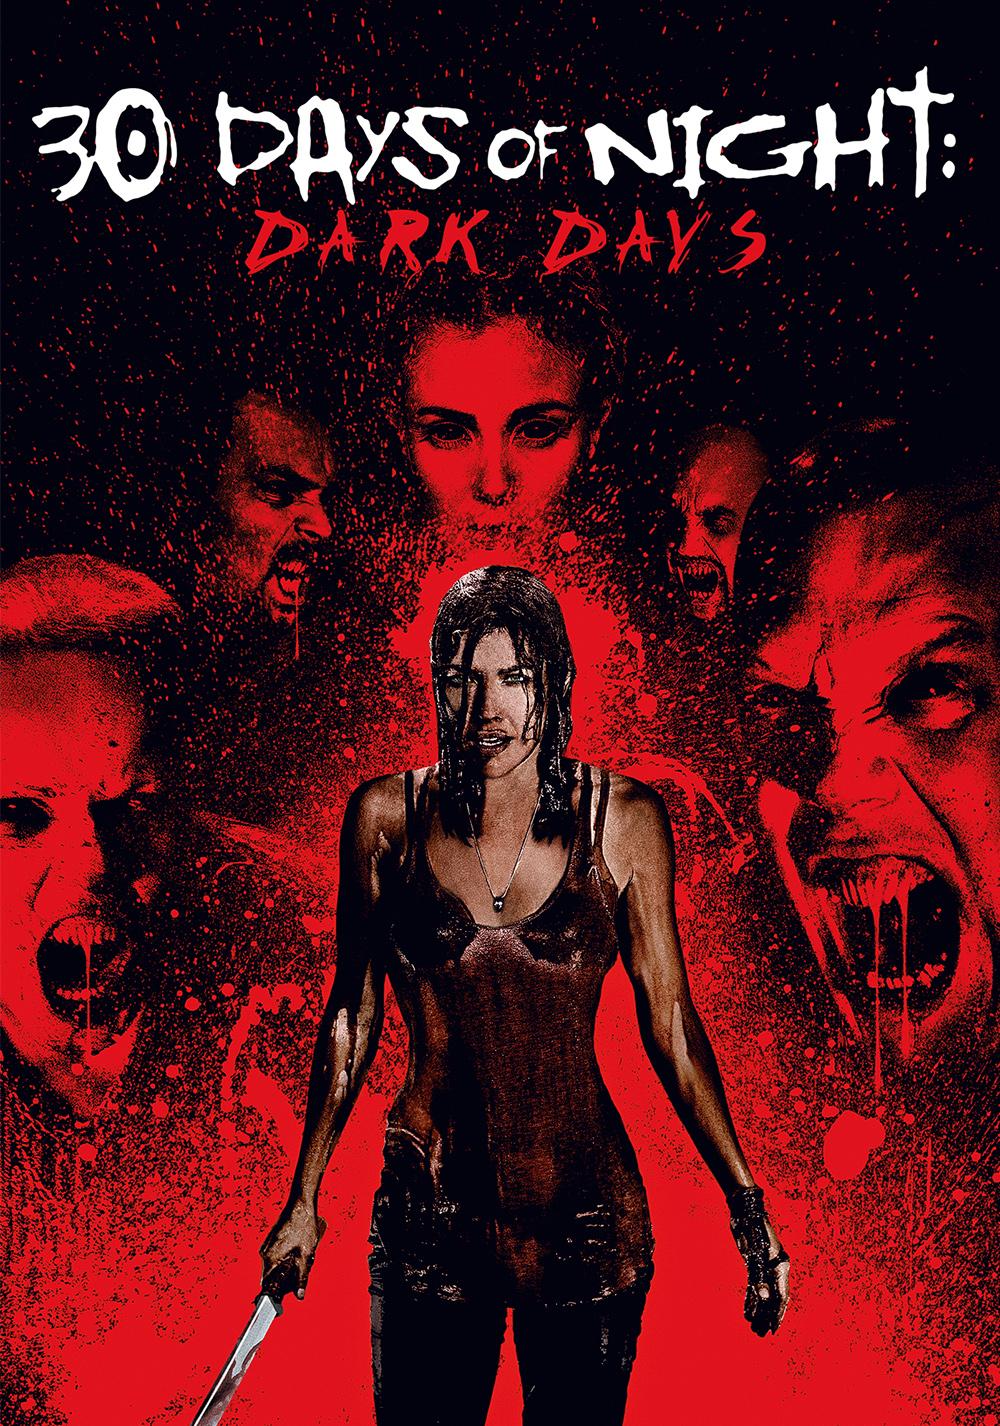 DarkDays.jpg